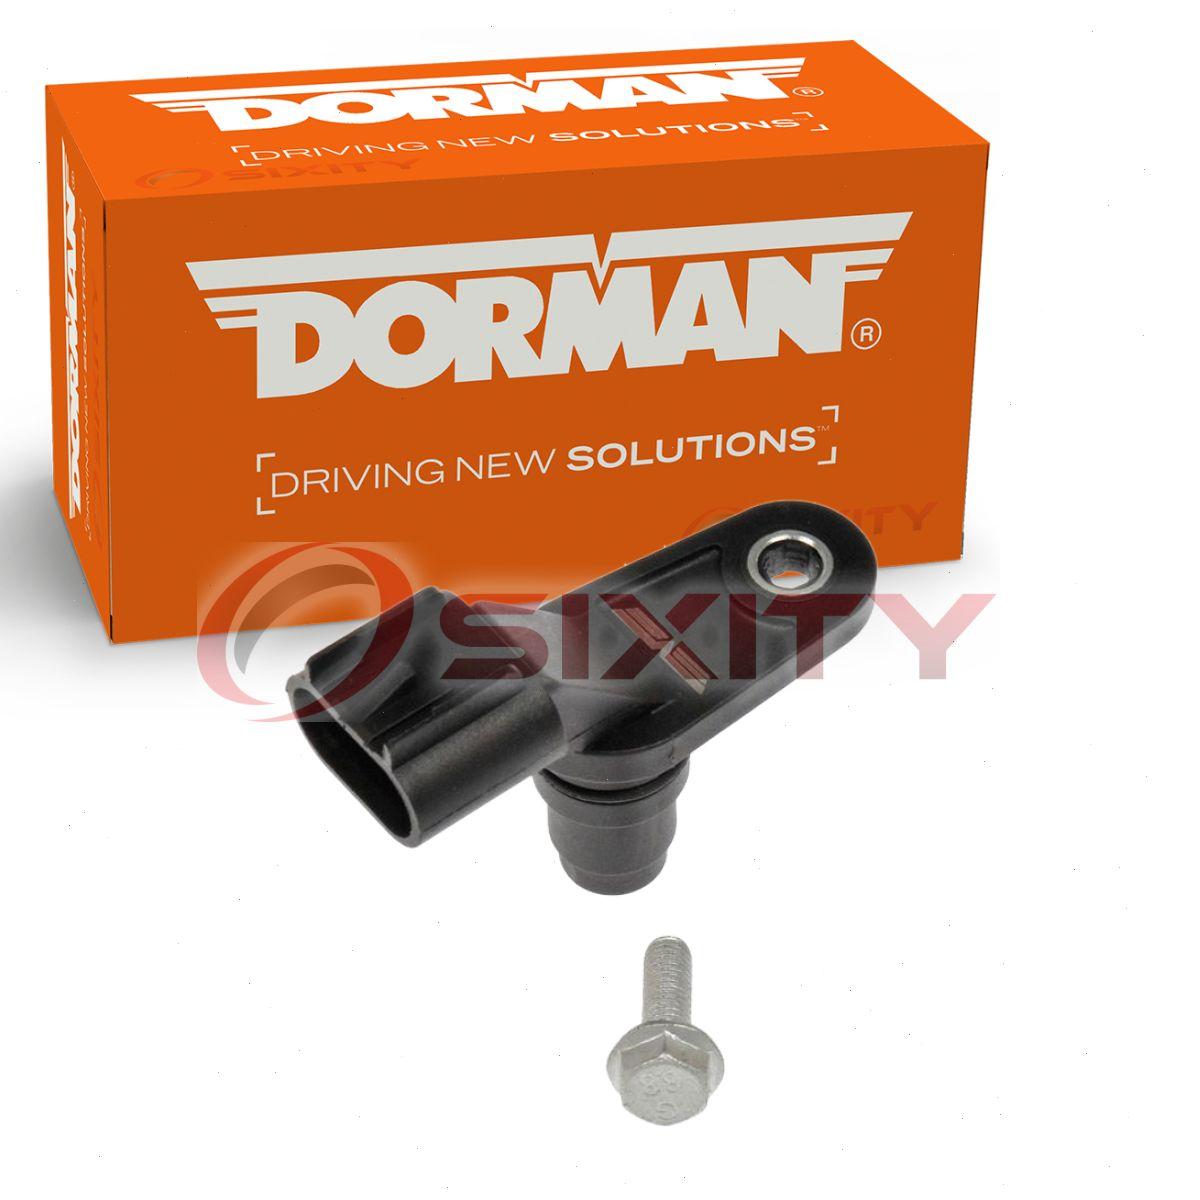 Dorman Camshaft Position Sensor For Chevy Equinox 2010